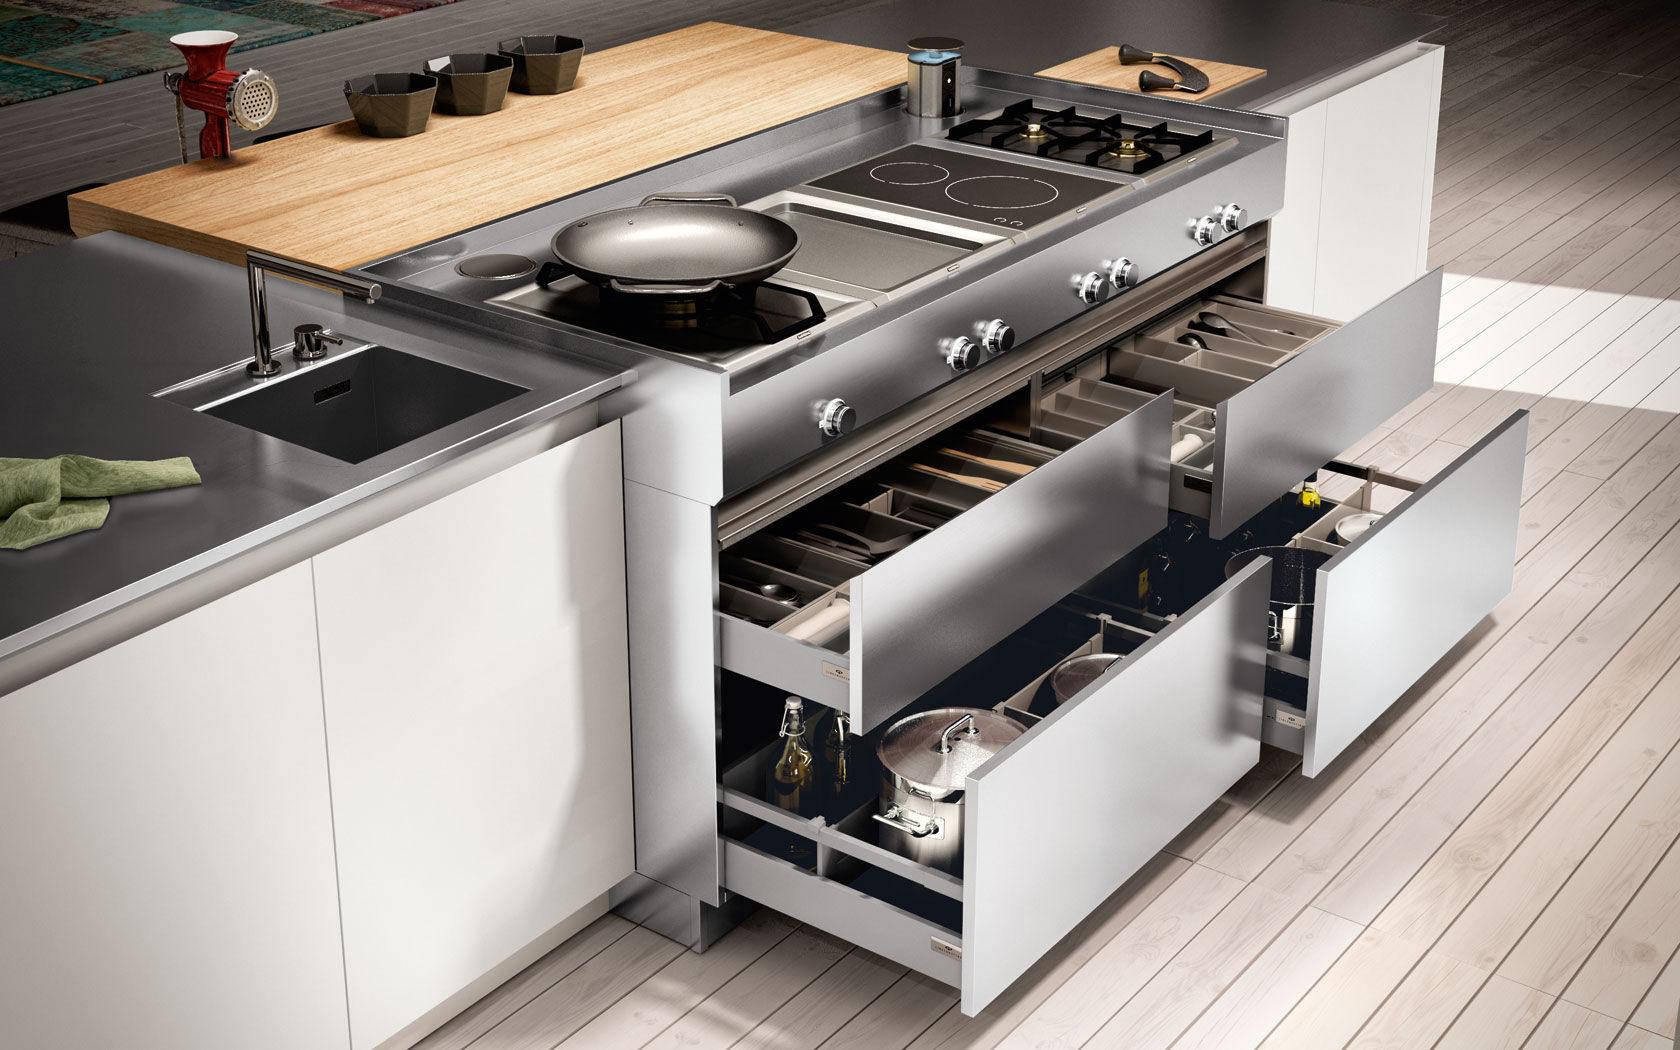 Cajón para cocina - AMBRA - Lineaquattro